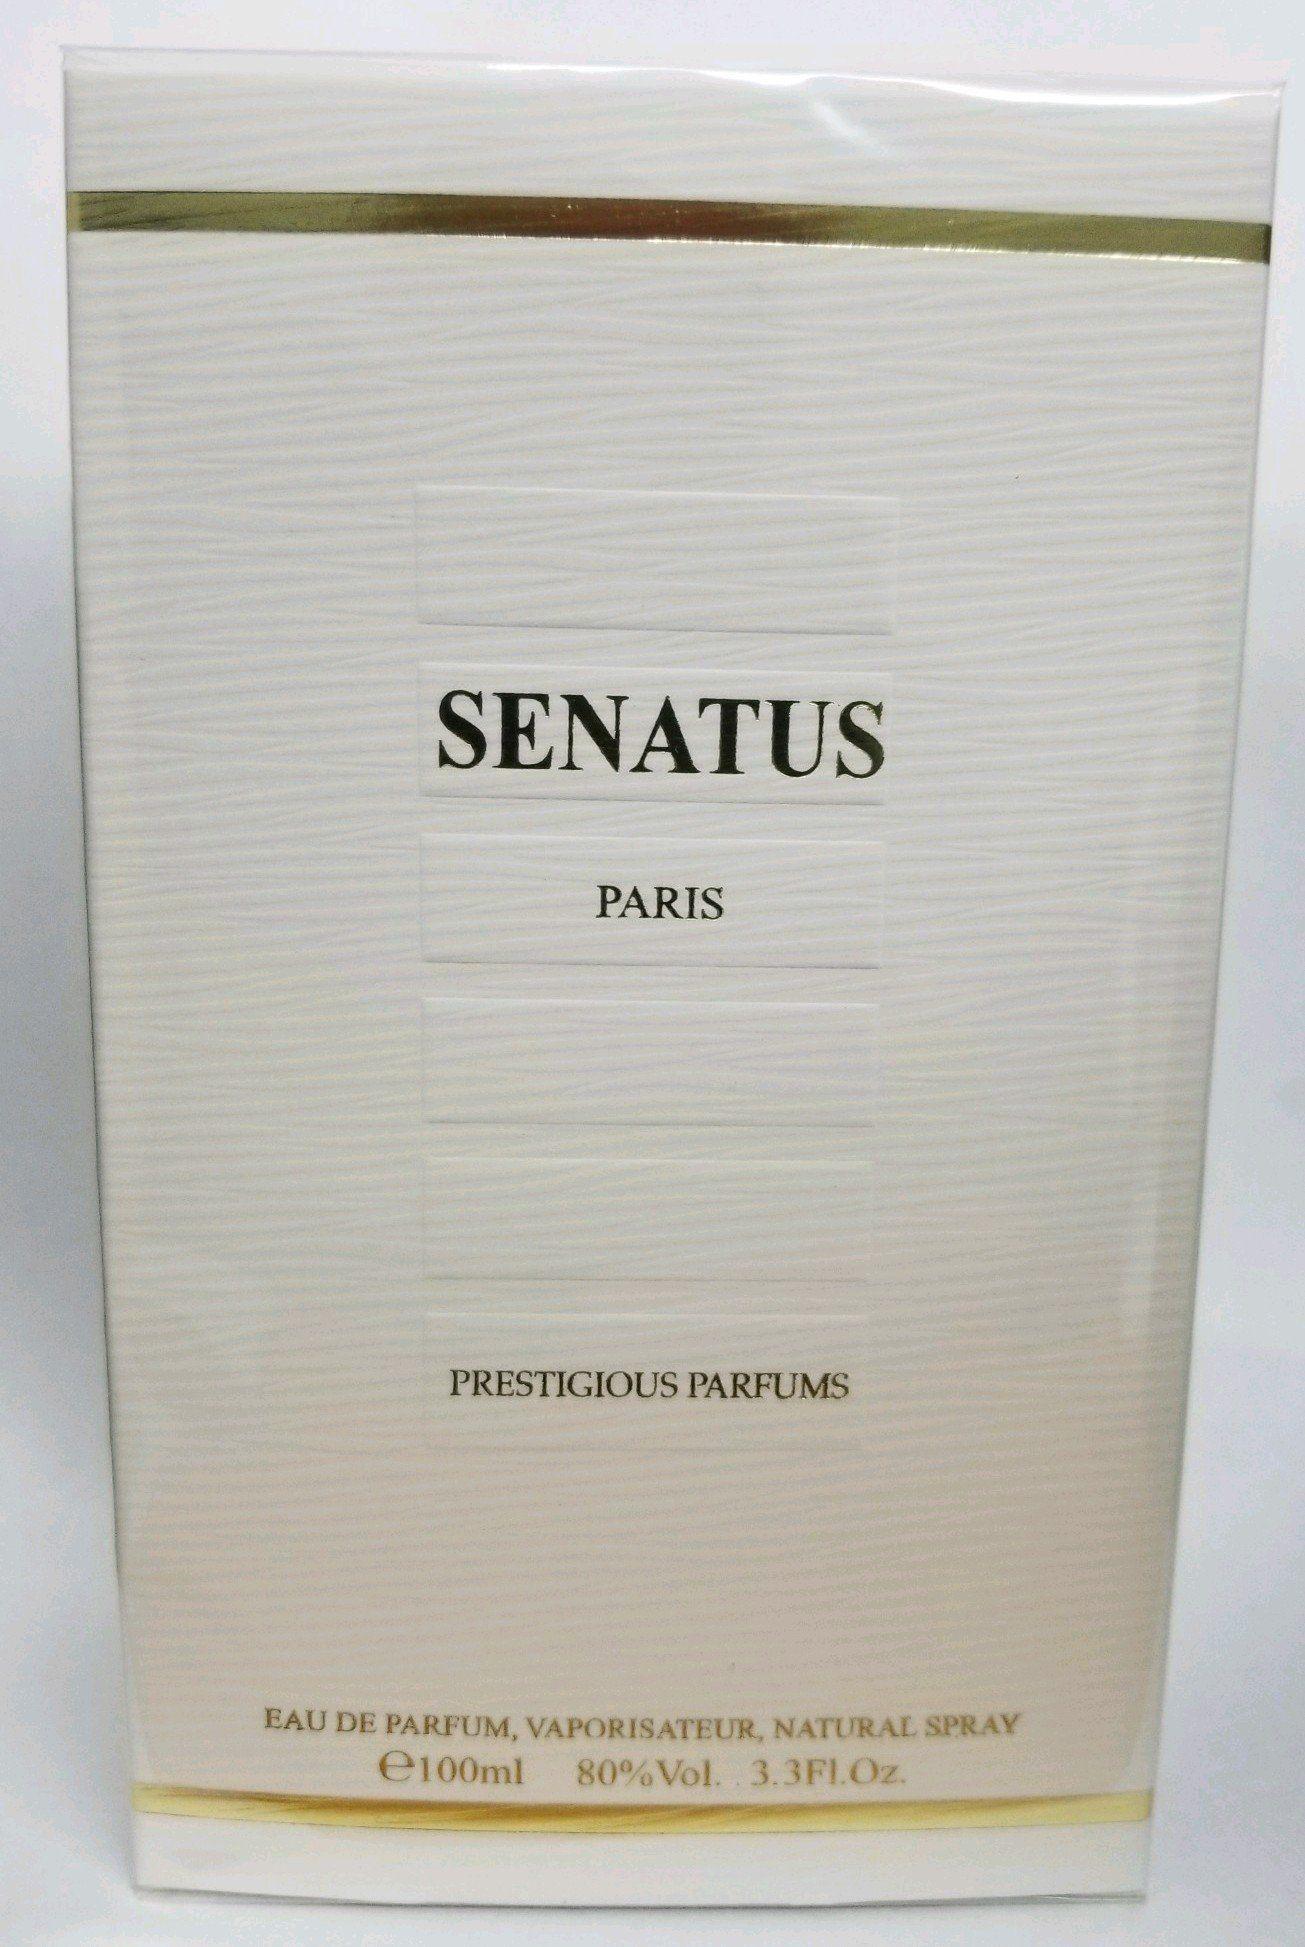 Senatus In 2018 Products Pinterest Perfume And The Prestige Parfum Original Amouage Reflection For Men By Sas Women Edp 33 Oz Conjuring